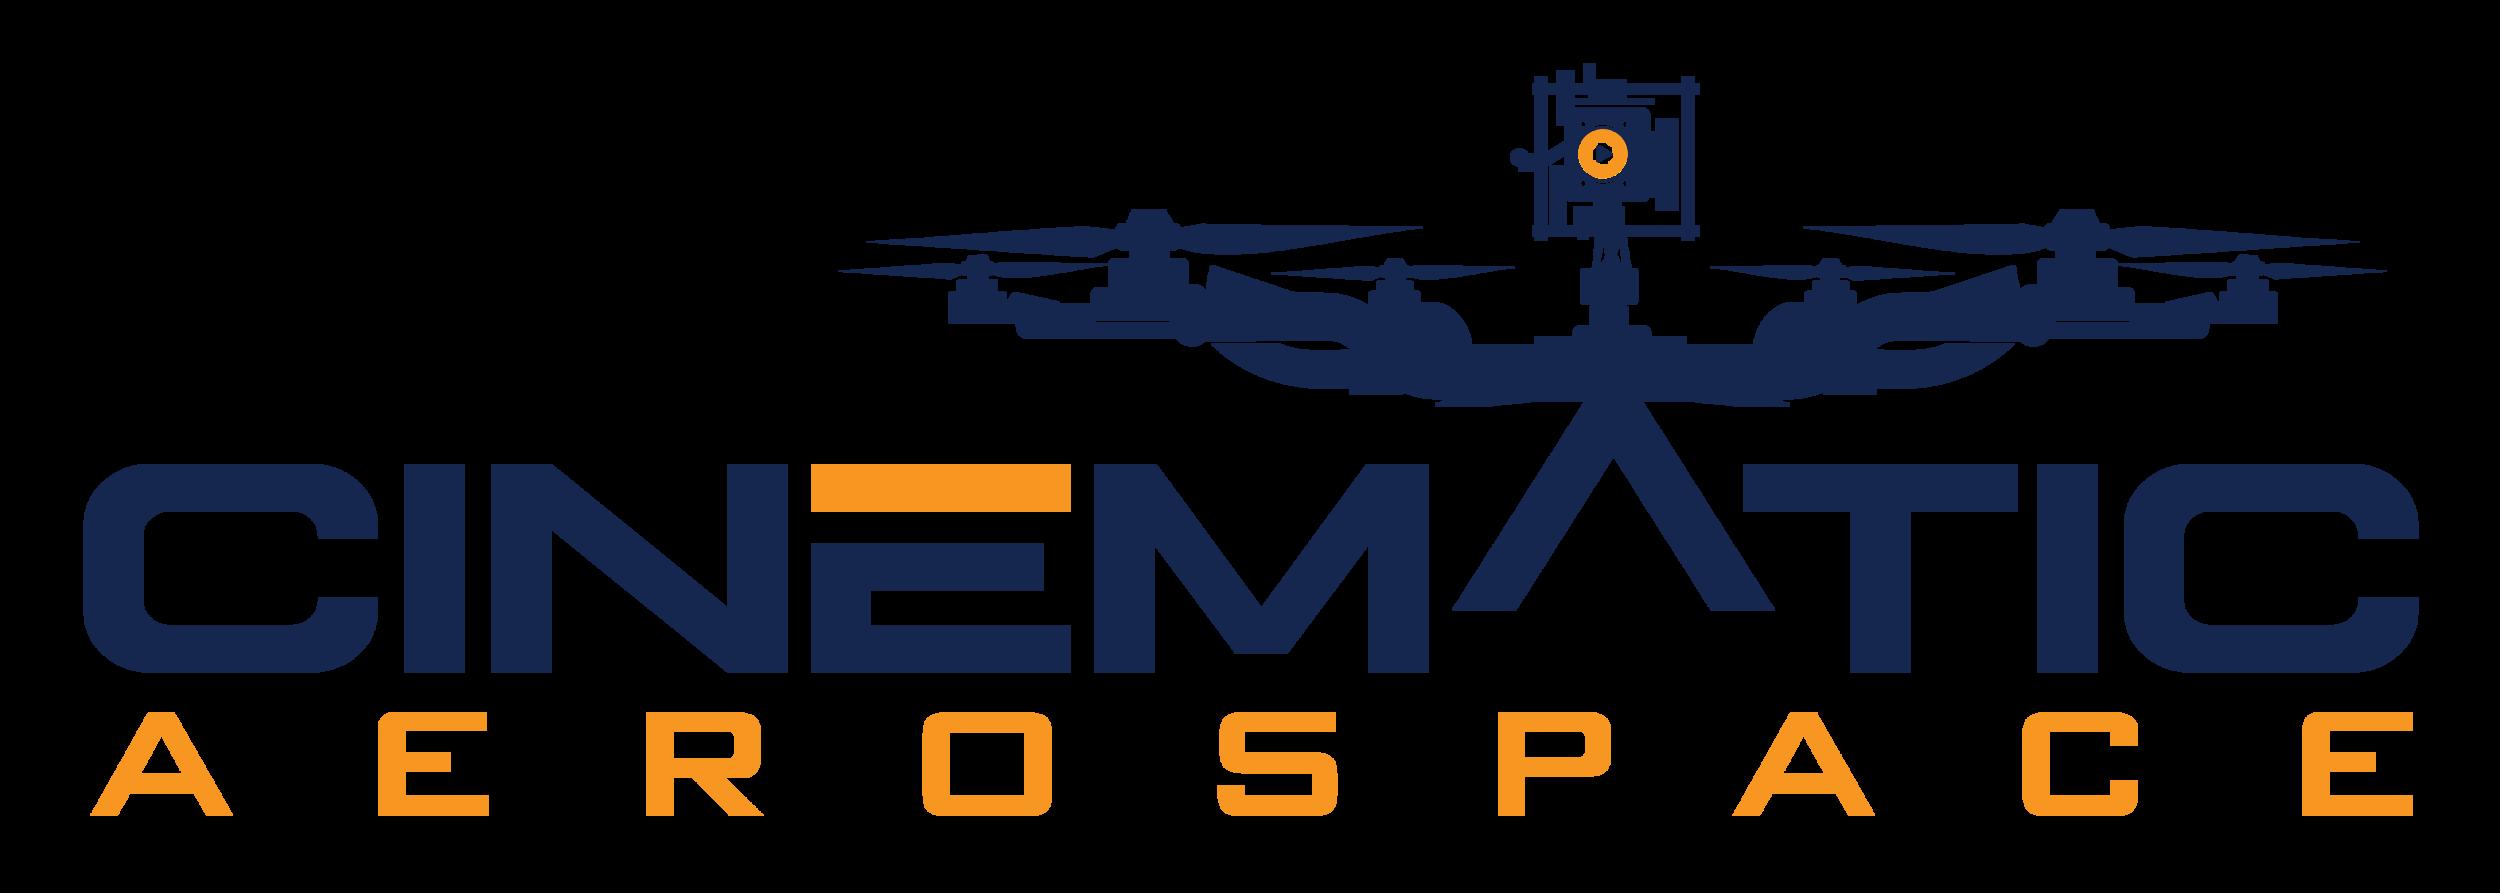 cinematic_aerospace.jpg